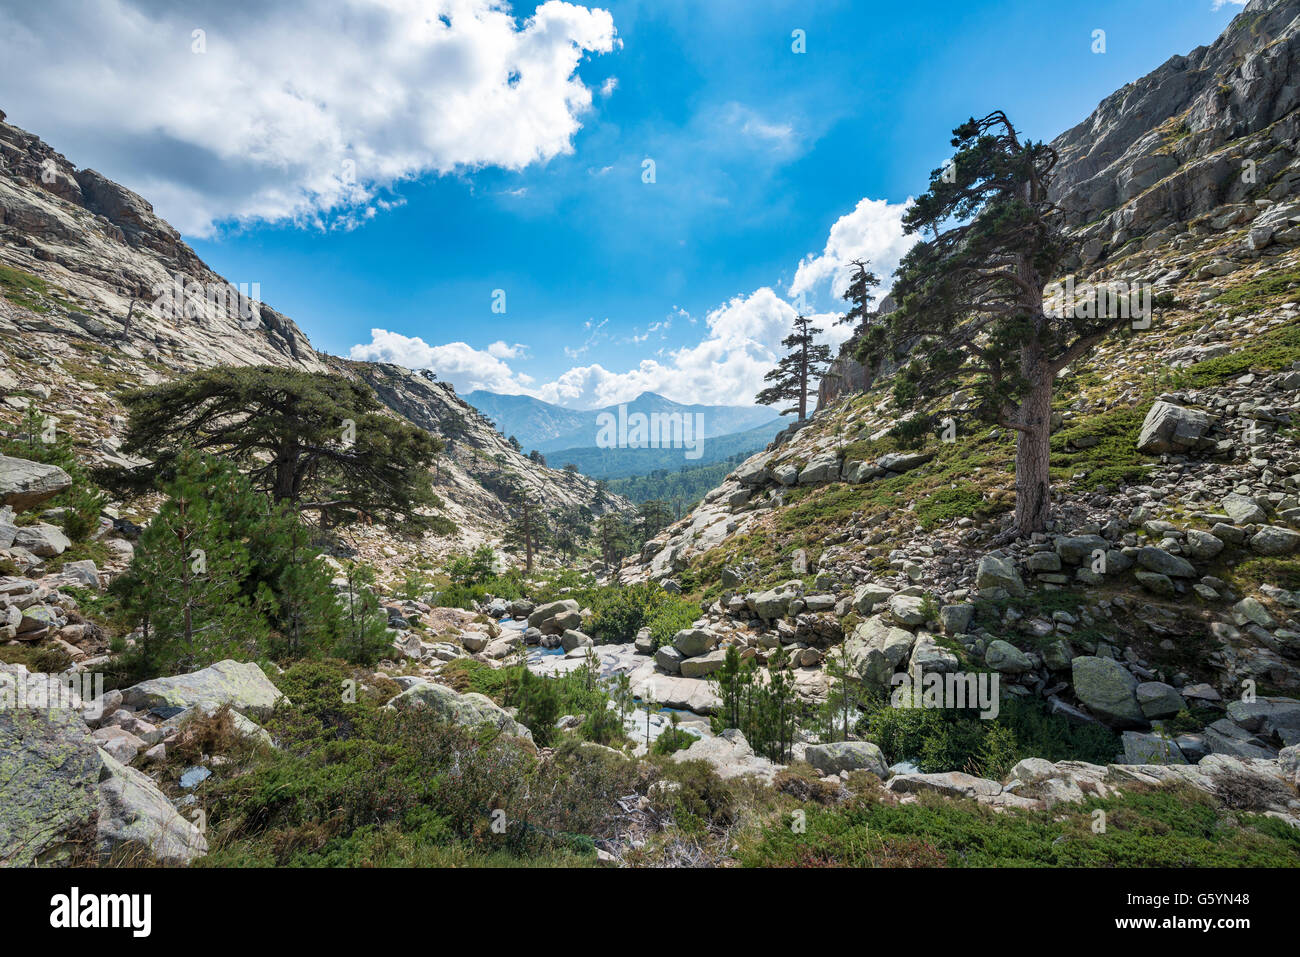 Berglandschaft in Golo Tal, Natur Naturpark von Korsika, Parc Naturel Régional de Corse, Korsika, Frankreich Stockfoto